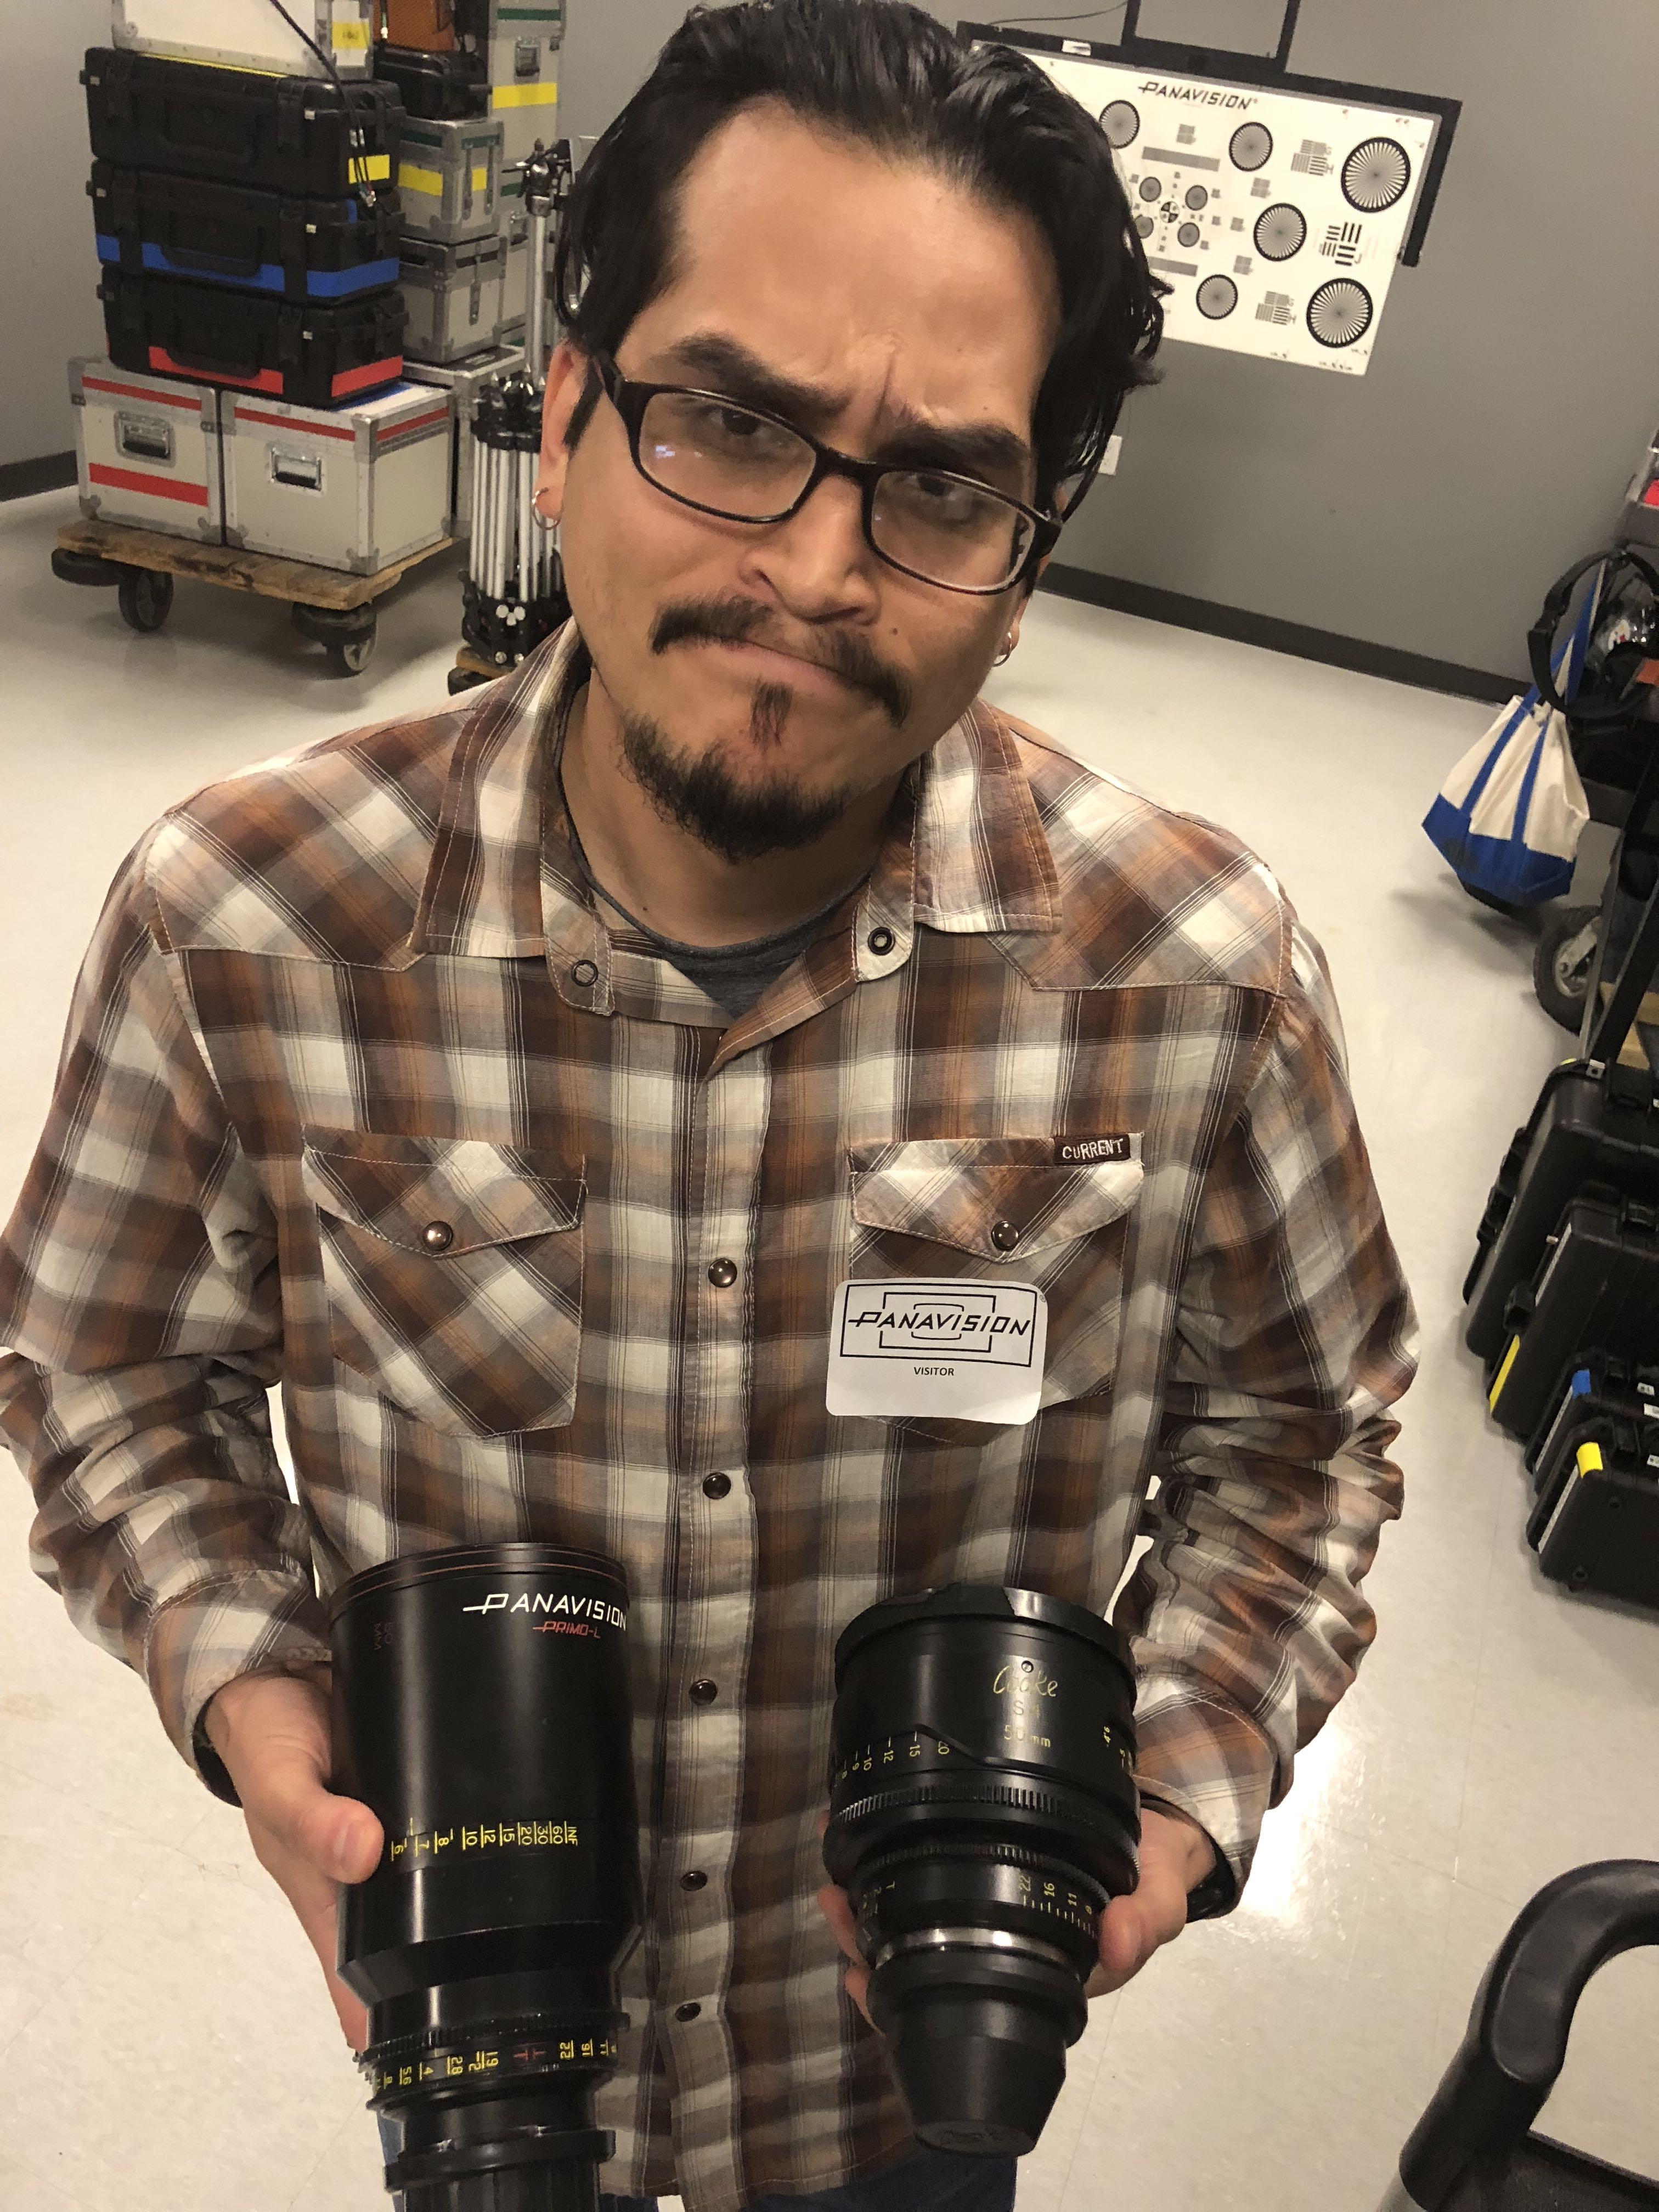 Filmmaker Friday featuring Filmmaker Miguel Angel Duran 5